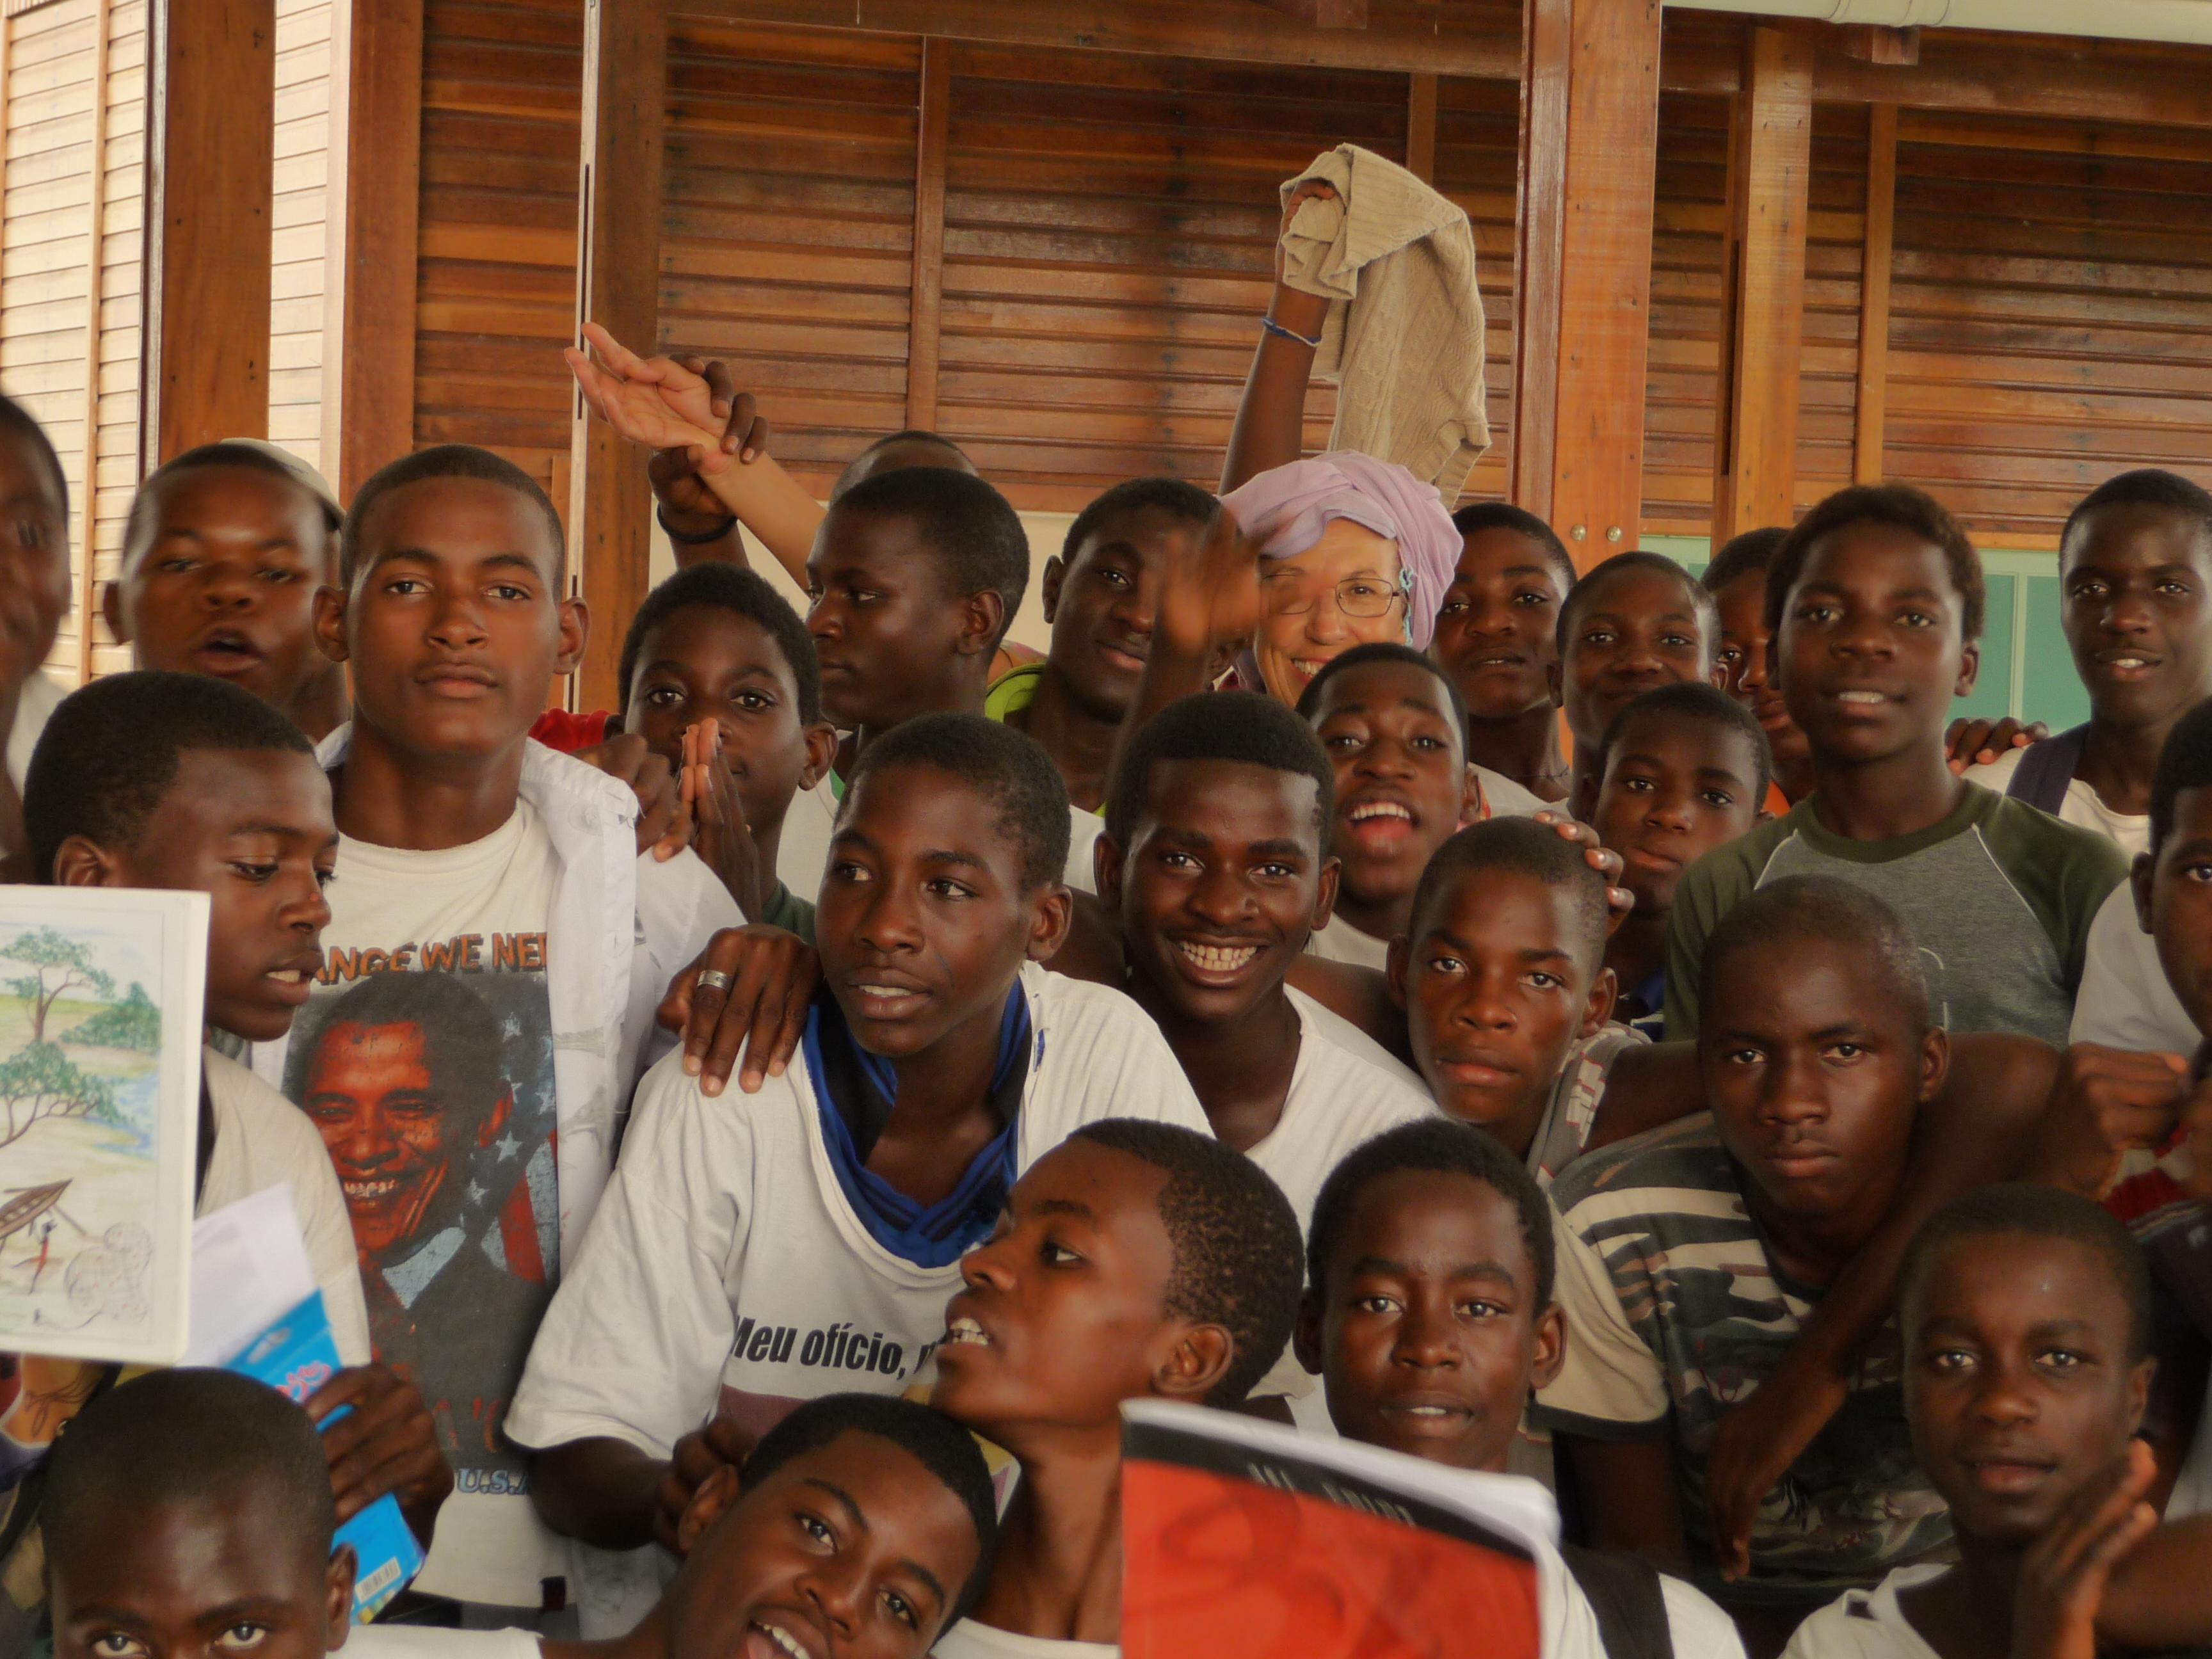 Ragazzi Angola Muxima